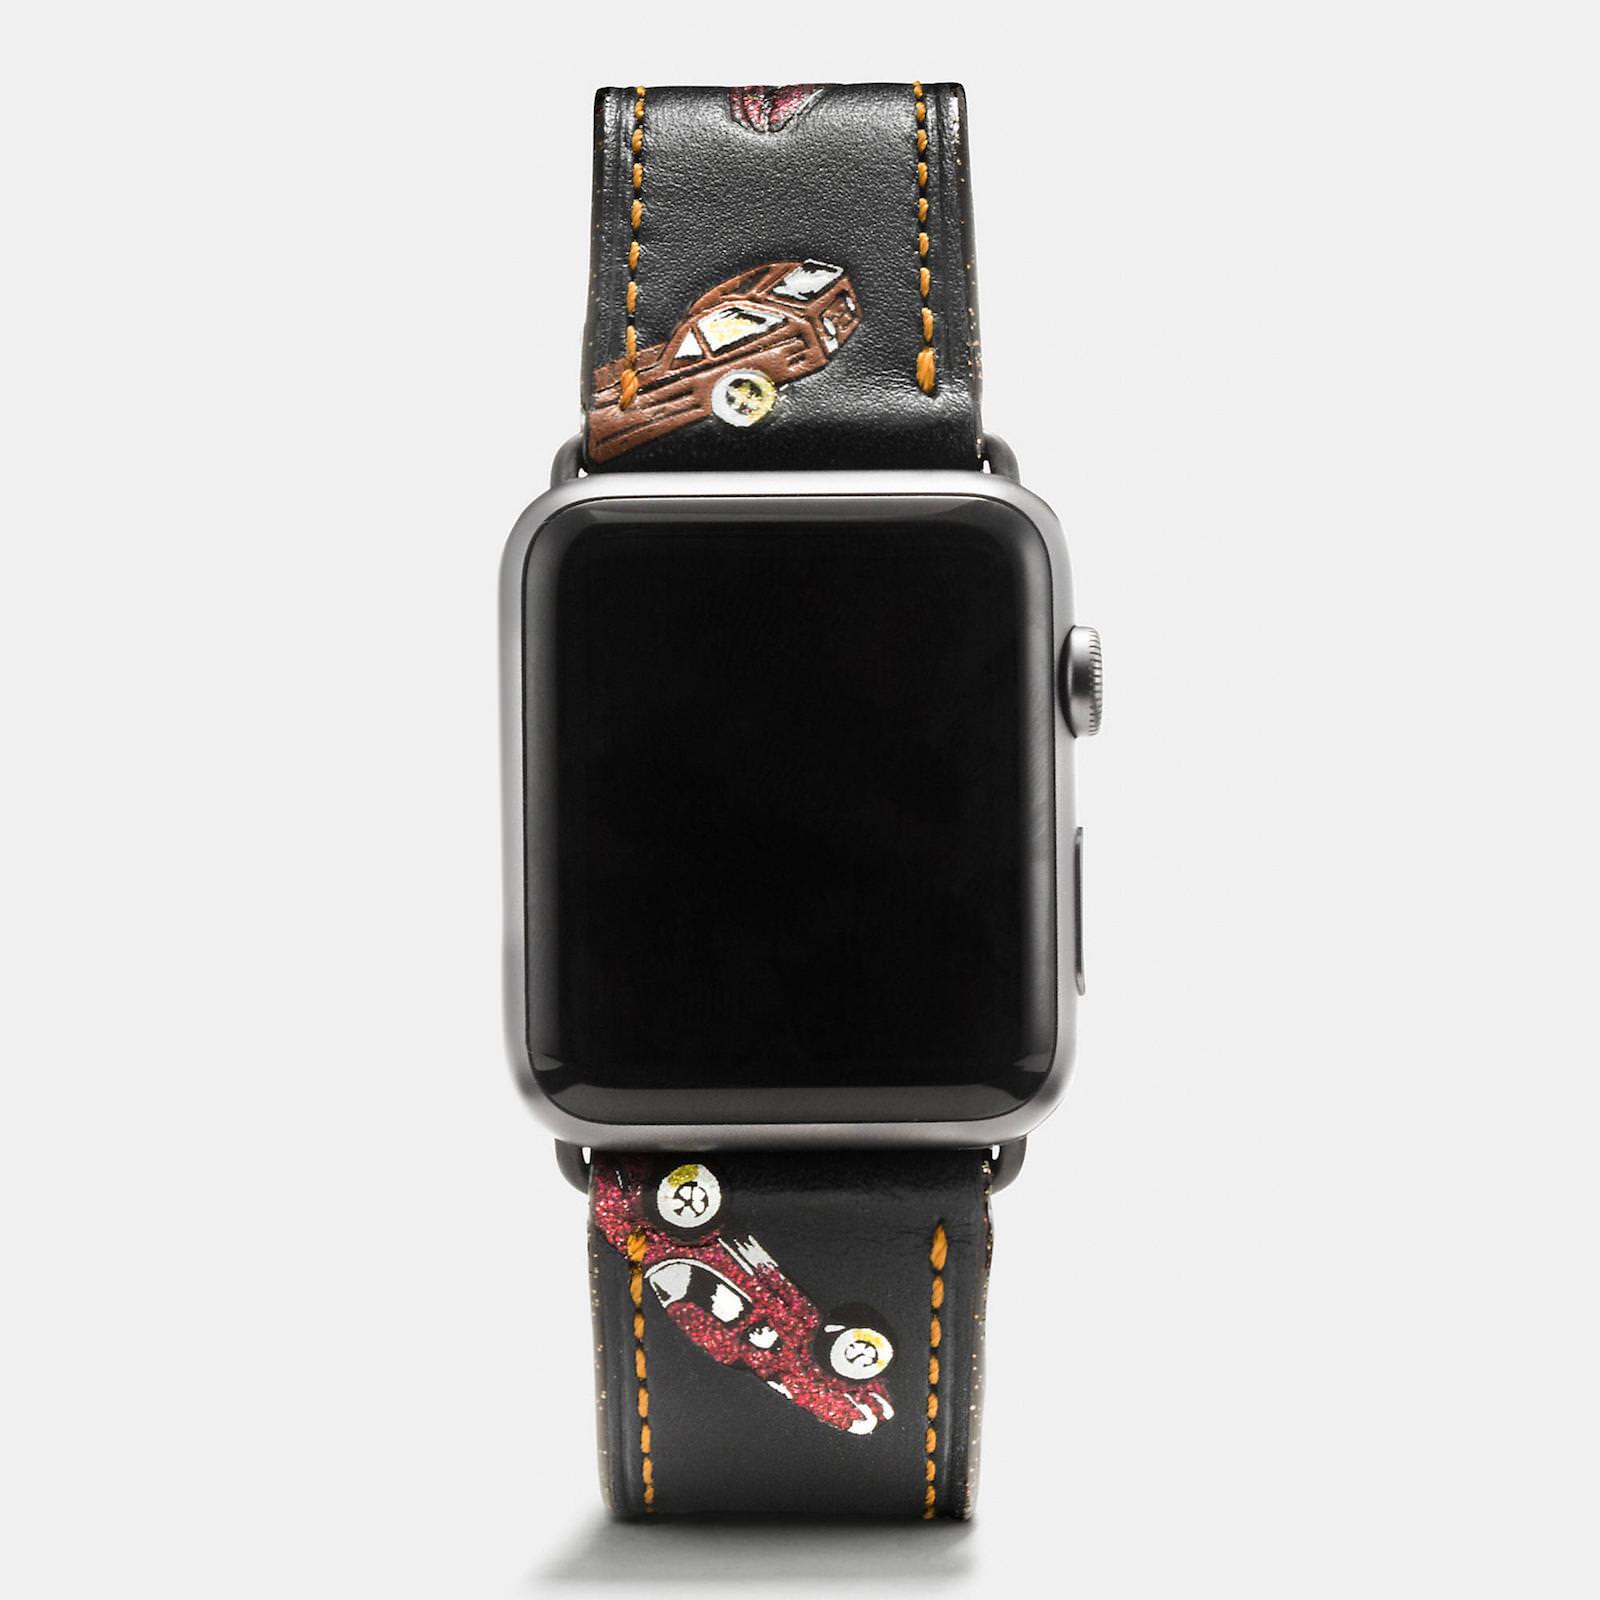 Apple-Watch-Coach-Band-Autumn-Season-1.jpeg